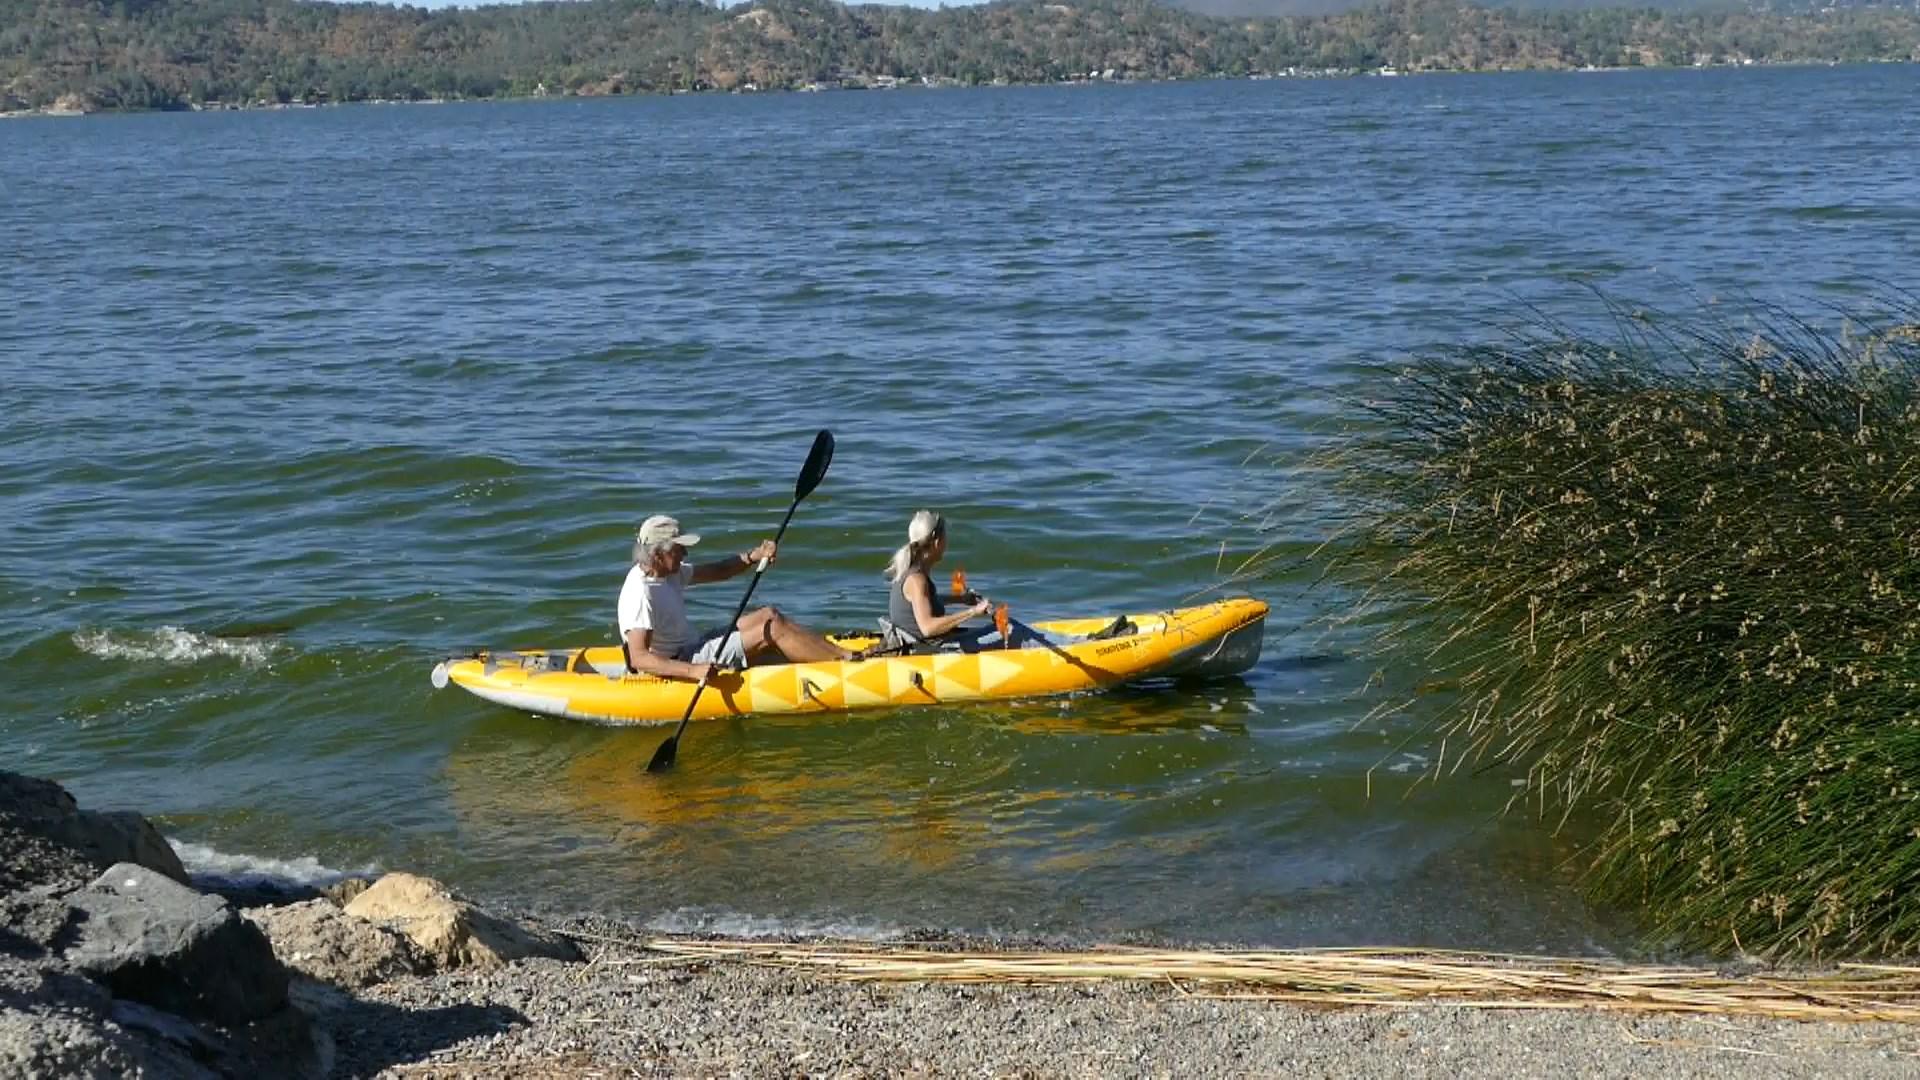 Advanced Elements StraitEdge2 Pro Inflatable Kayak - Paddled tandem.